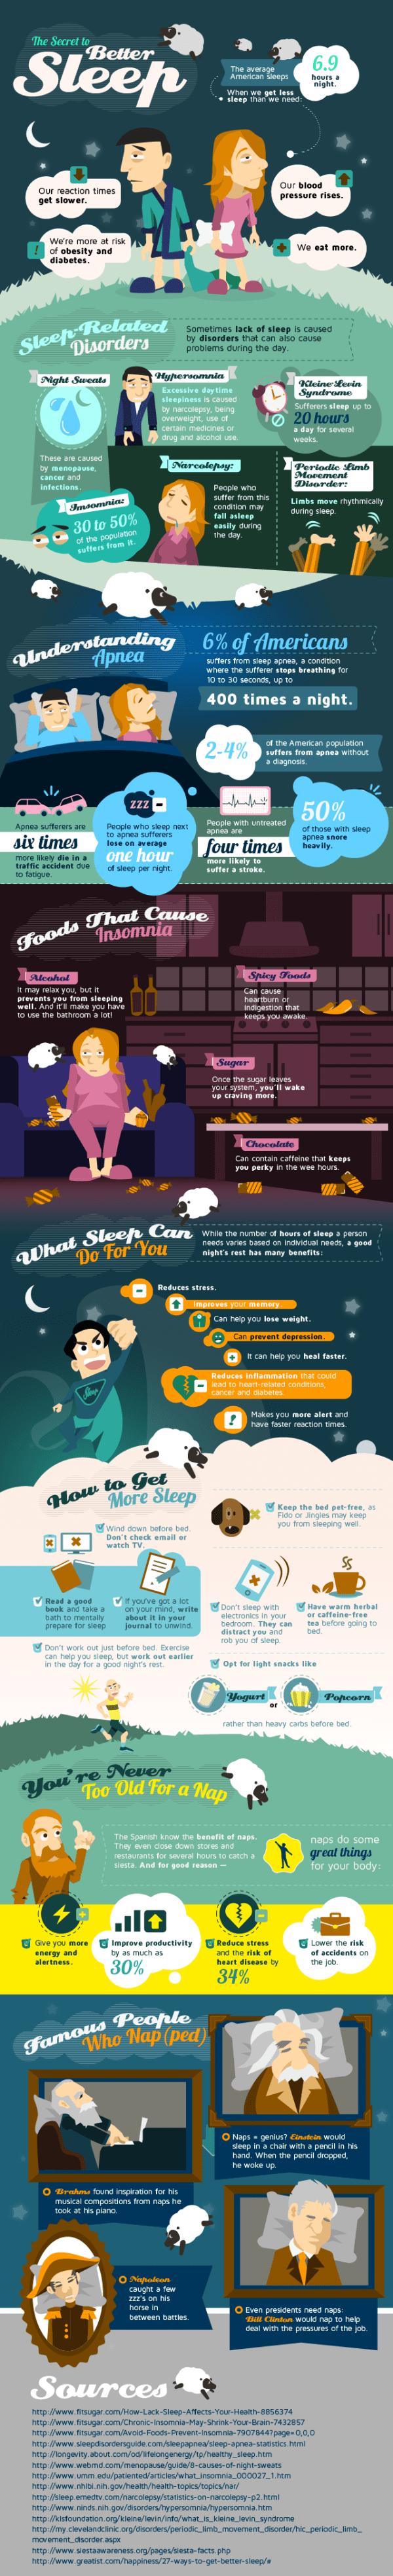 The-Secret-to-Better-Sleep-Infographic1